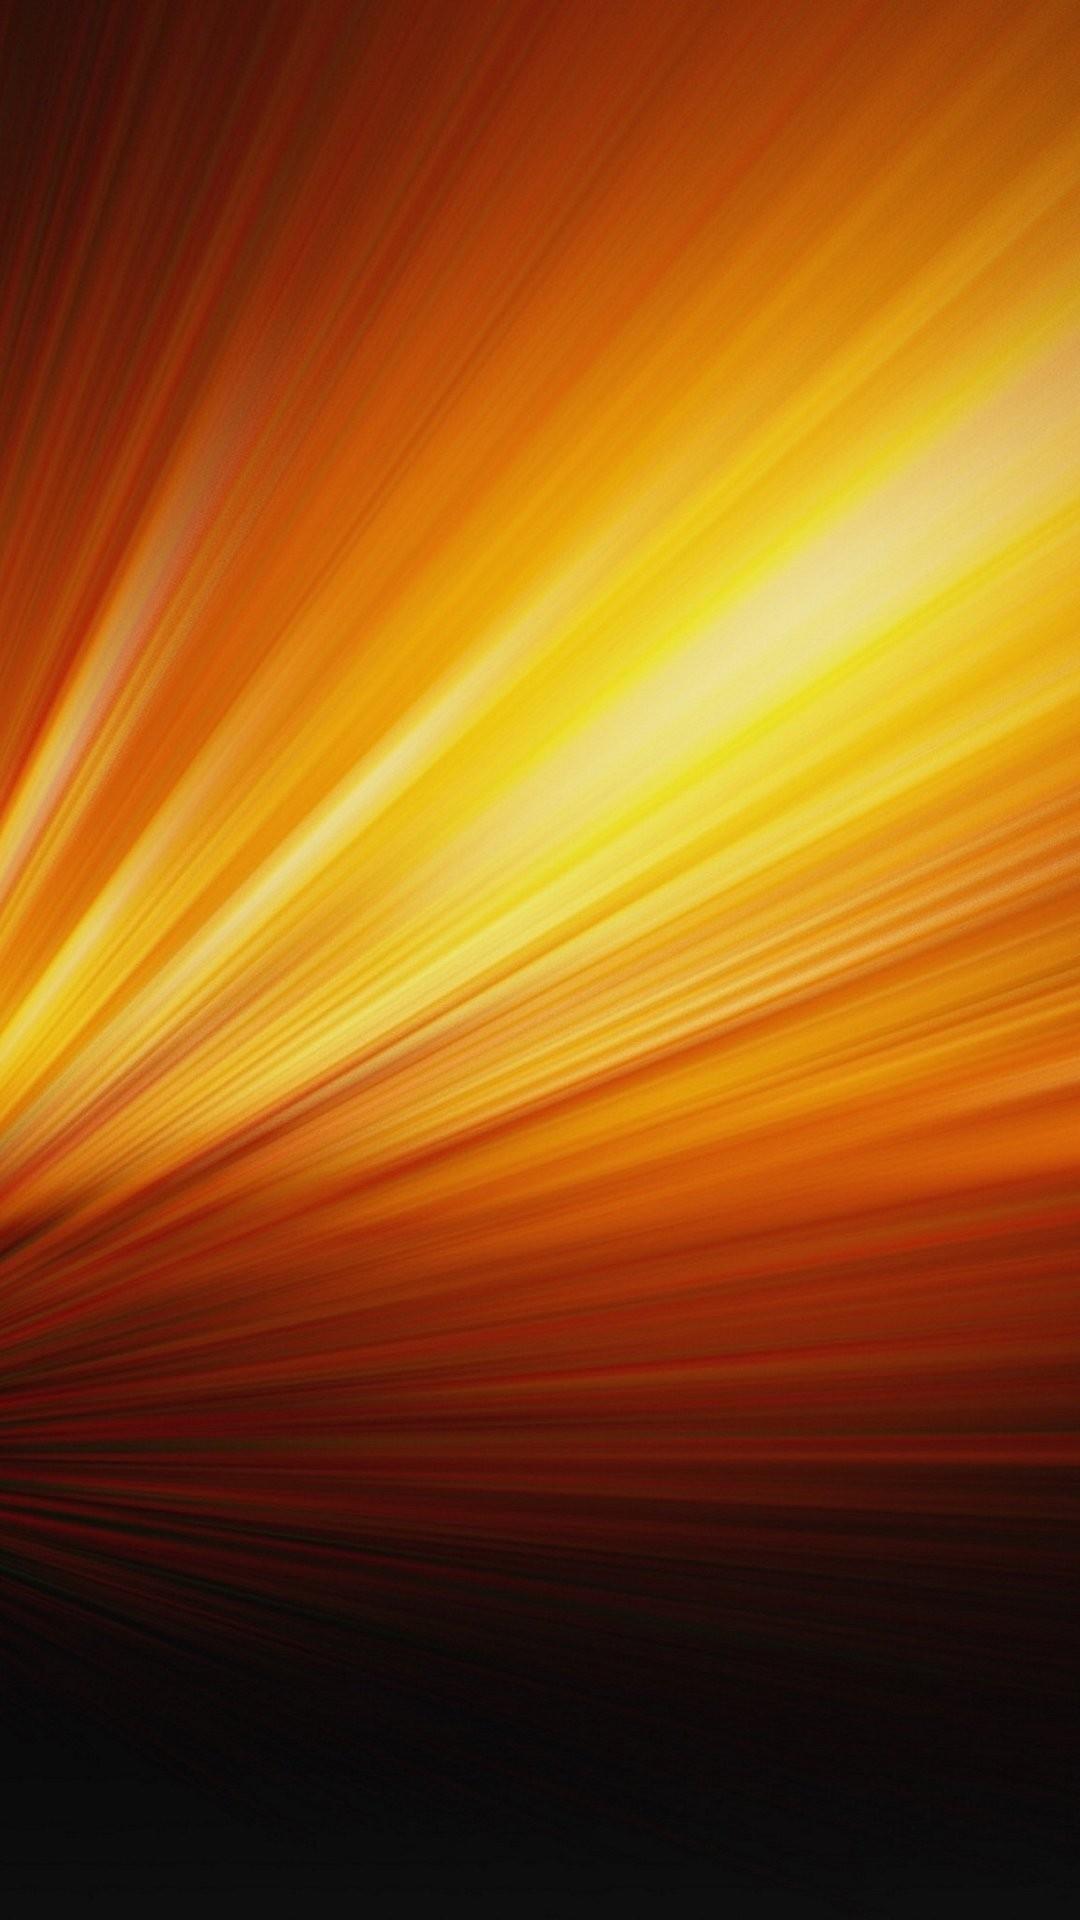 Orange Light HD iPhone 6 Plus Wallpaper 34823 – Abstract iPhone 6 Plus  Wallpapers